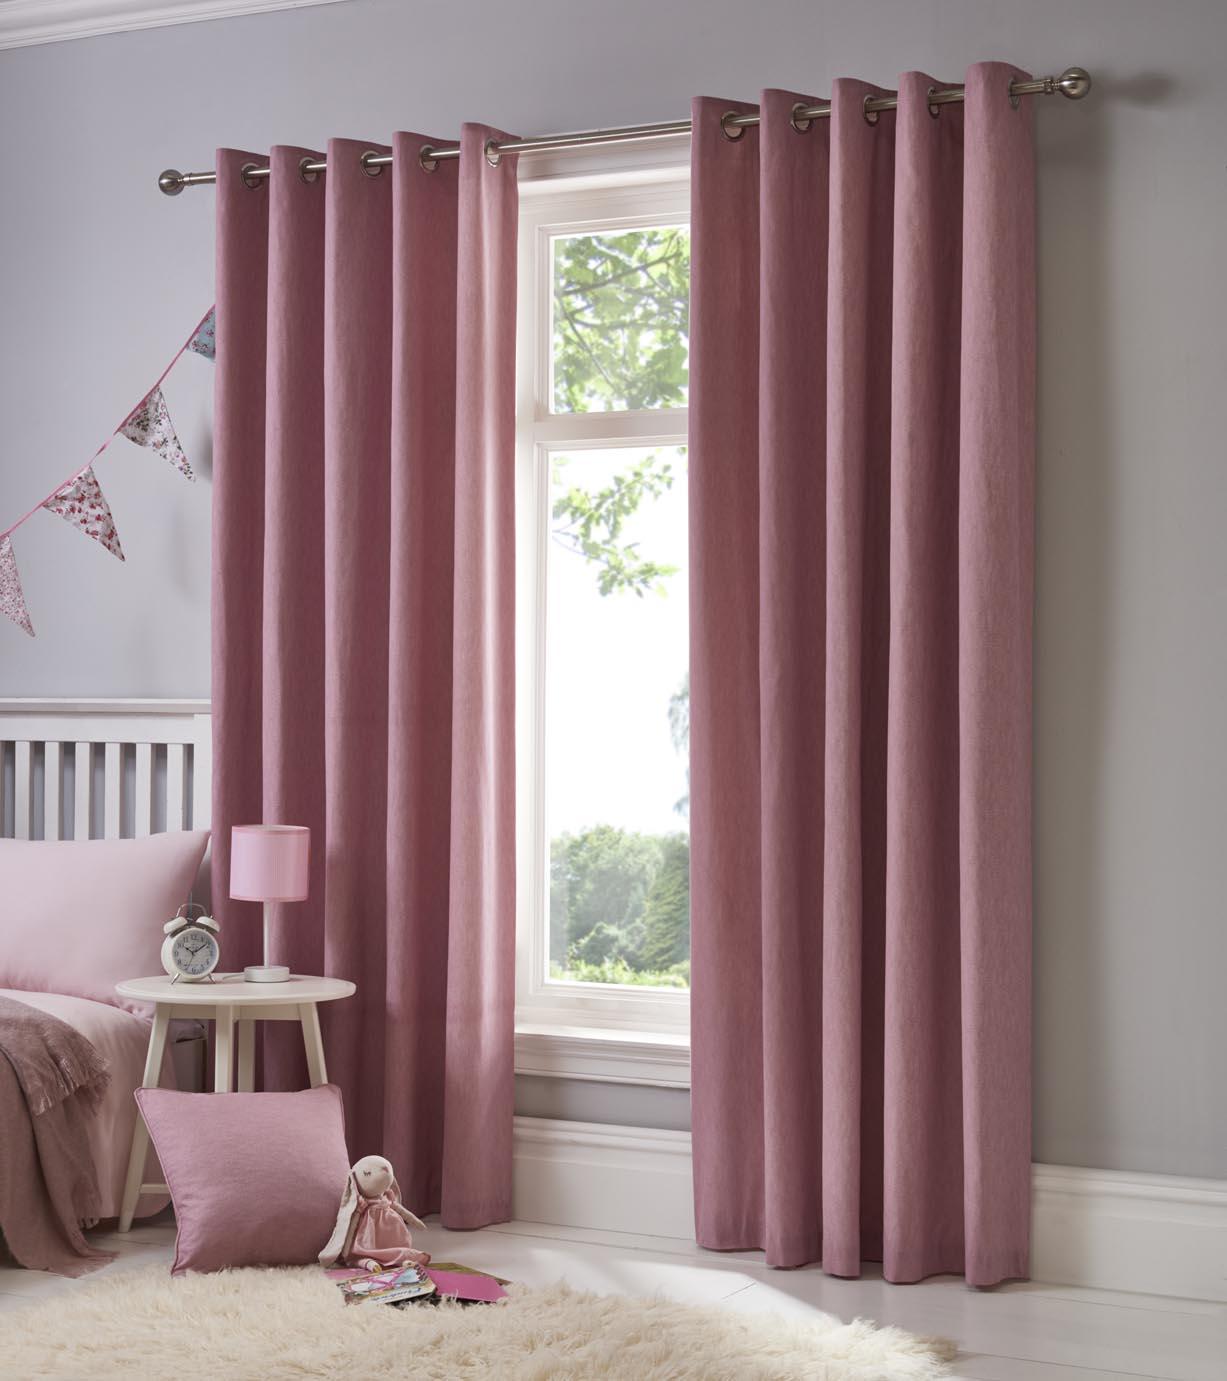 Sorbonne Eyelet Plain Curtains